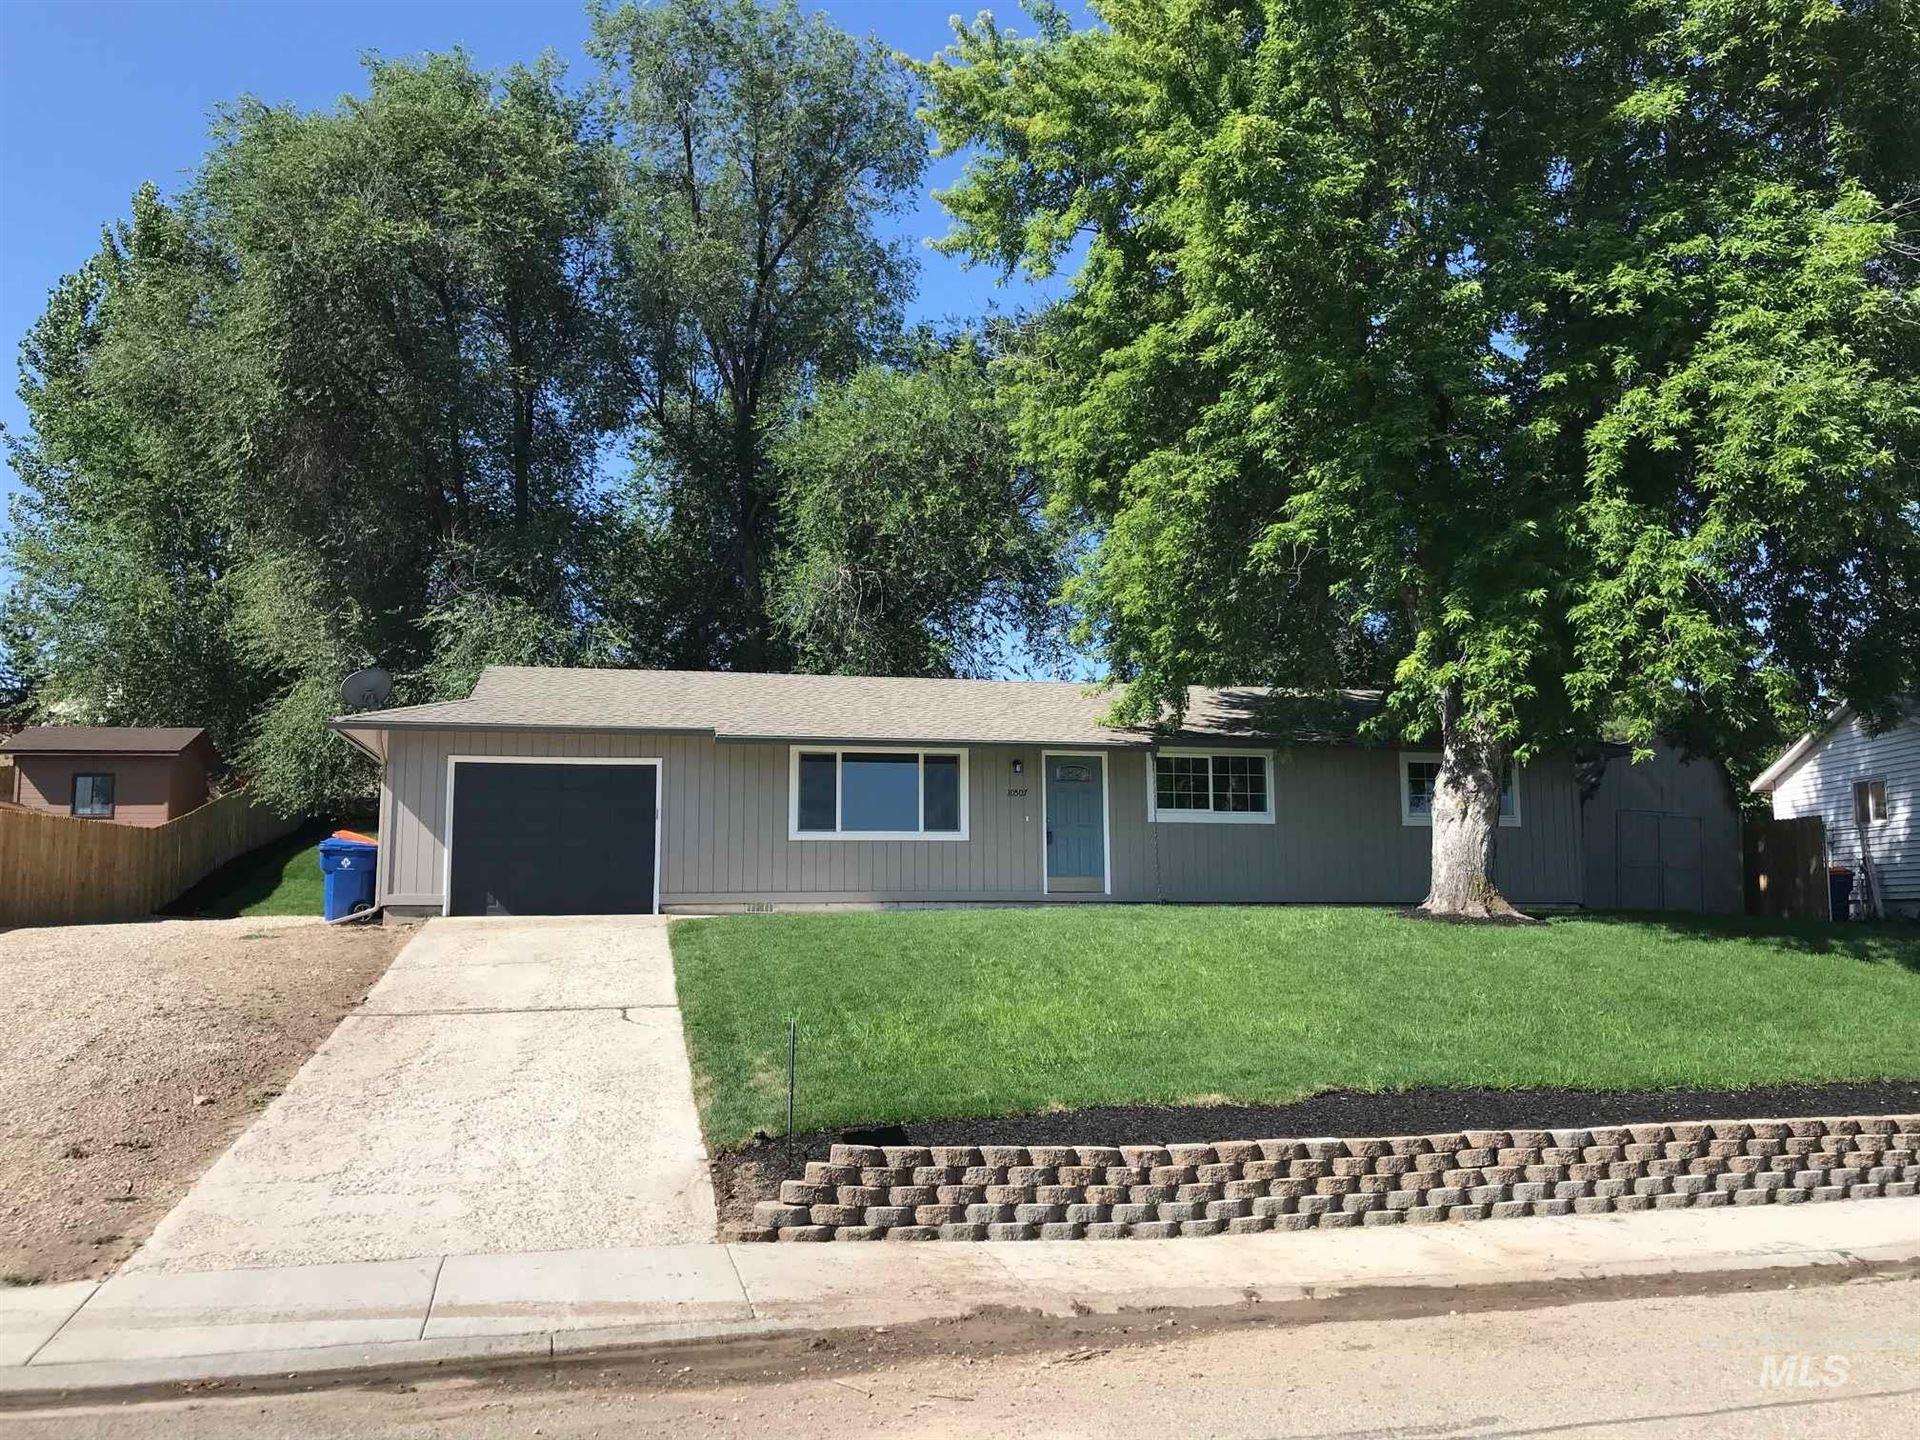 10507 Tanglewood, Boise, ID 83709 - #: 98772561